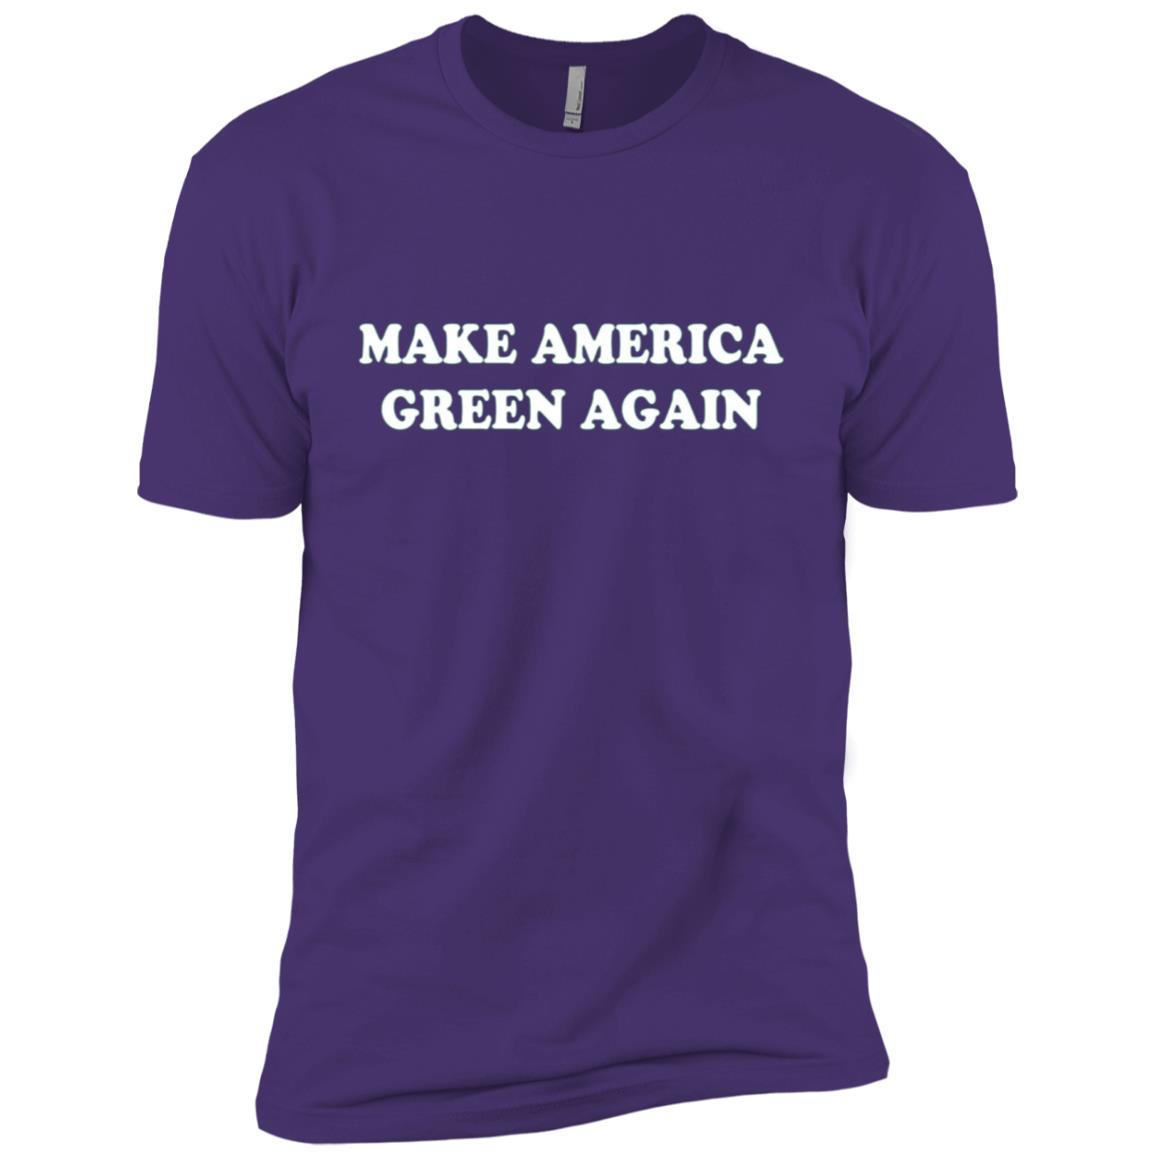 Original Make America Green Again Text Only Men Short Sleeve T-Shirt